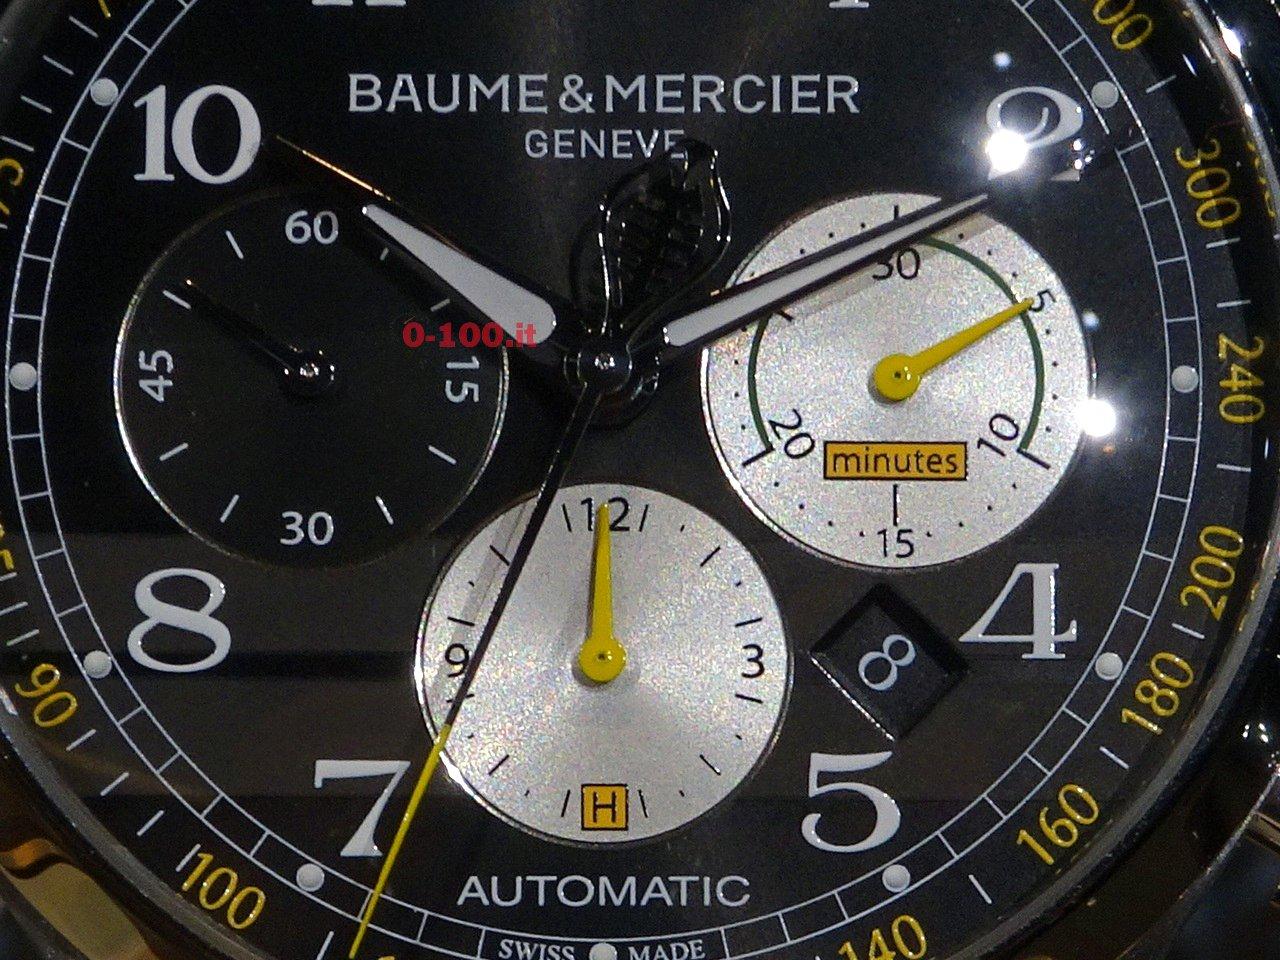 Baume-Mercier-SIHH-2016-0-100_25